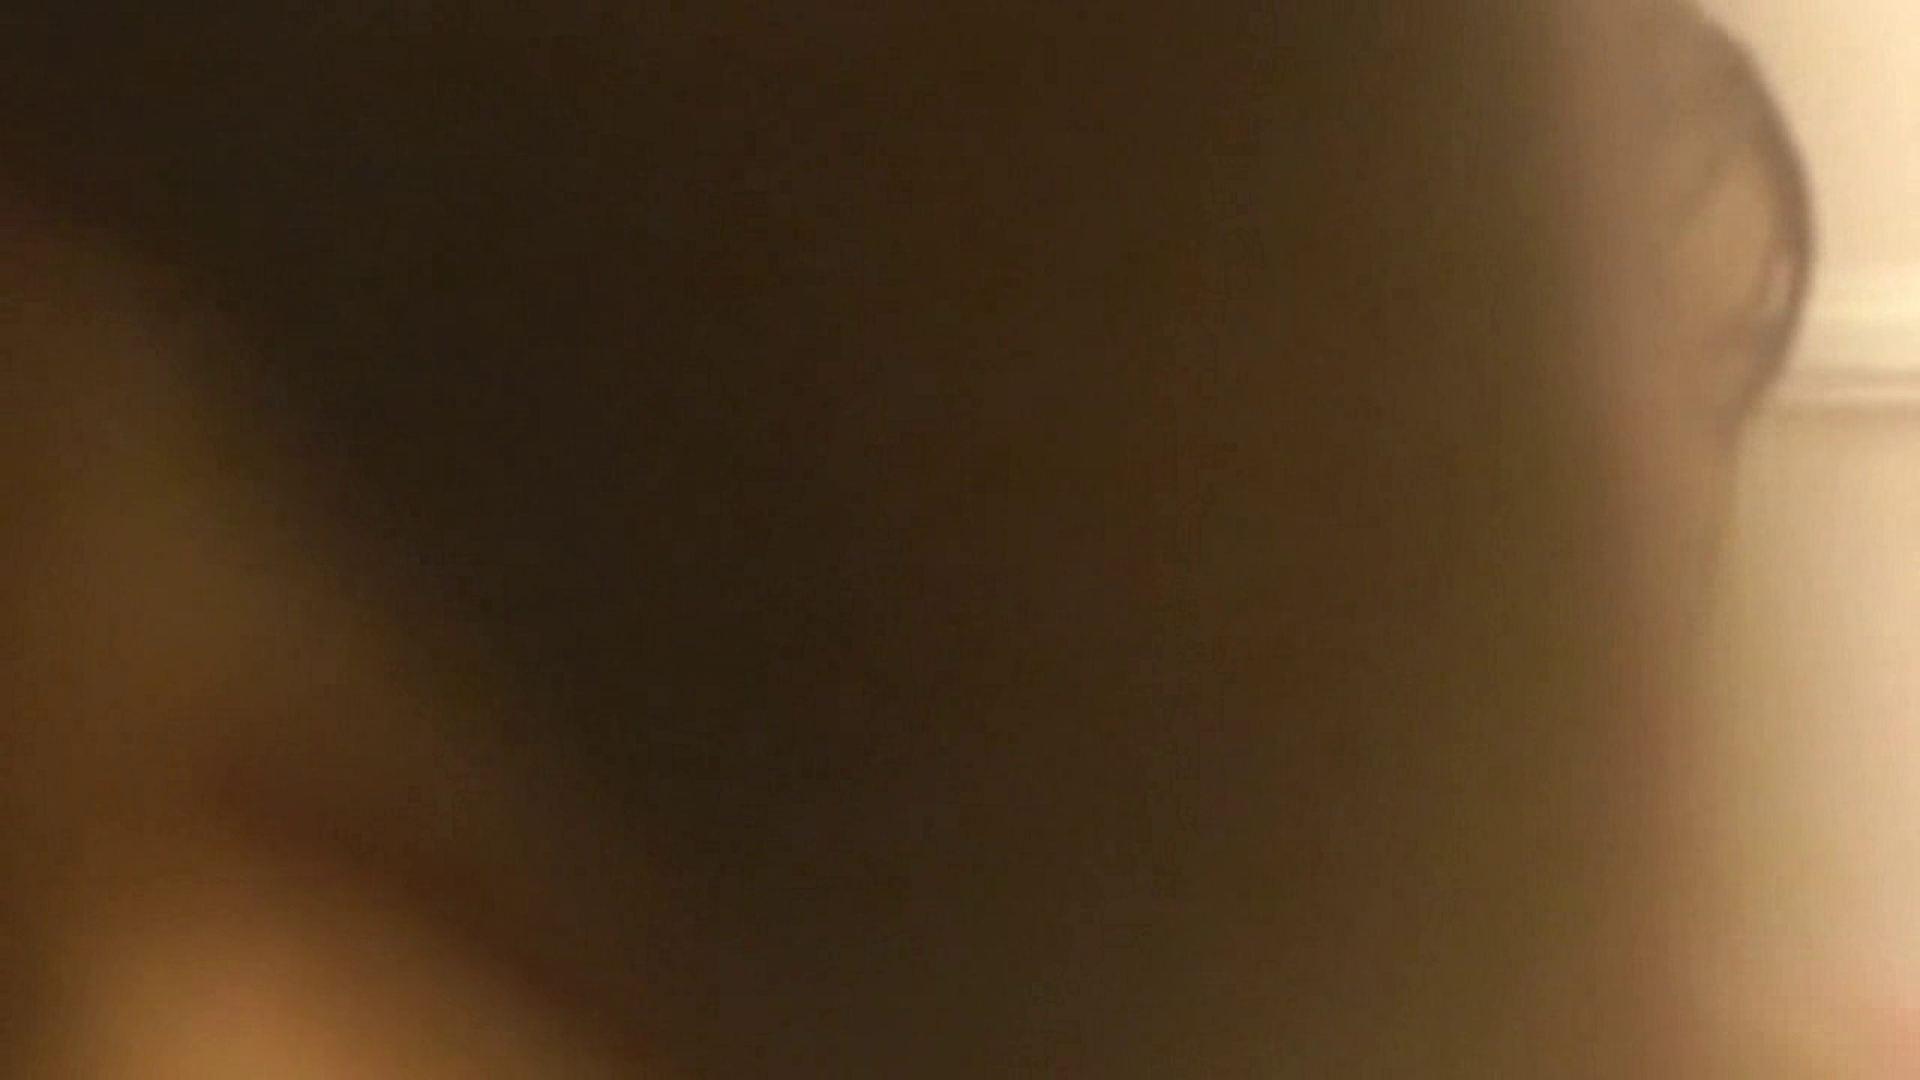 vol.1 Mayumi 窓越しに入浴シーン撮影に成功 OLの実態 | 入浴中のオンナ  17pic 9